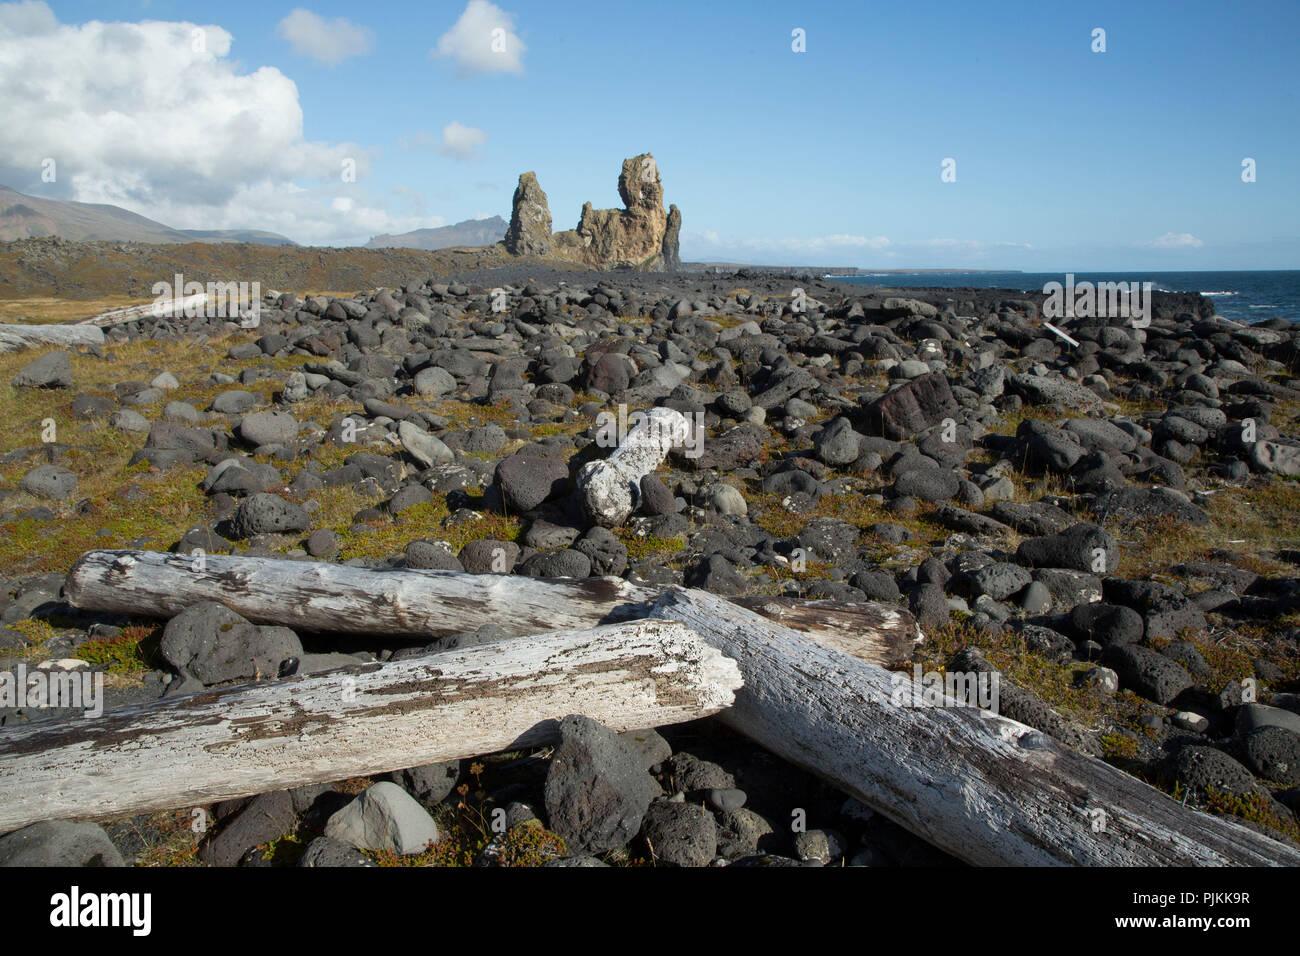 Iceland, Snaefellsnes, Cliffs of Londrangar, driftwood on the lava beach, volcano vent, blue sky - Stock Image